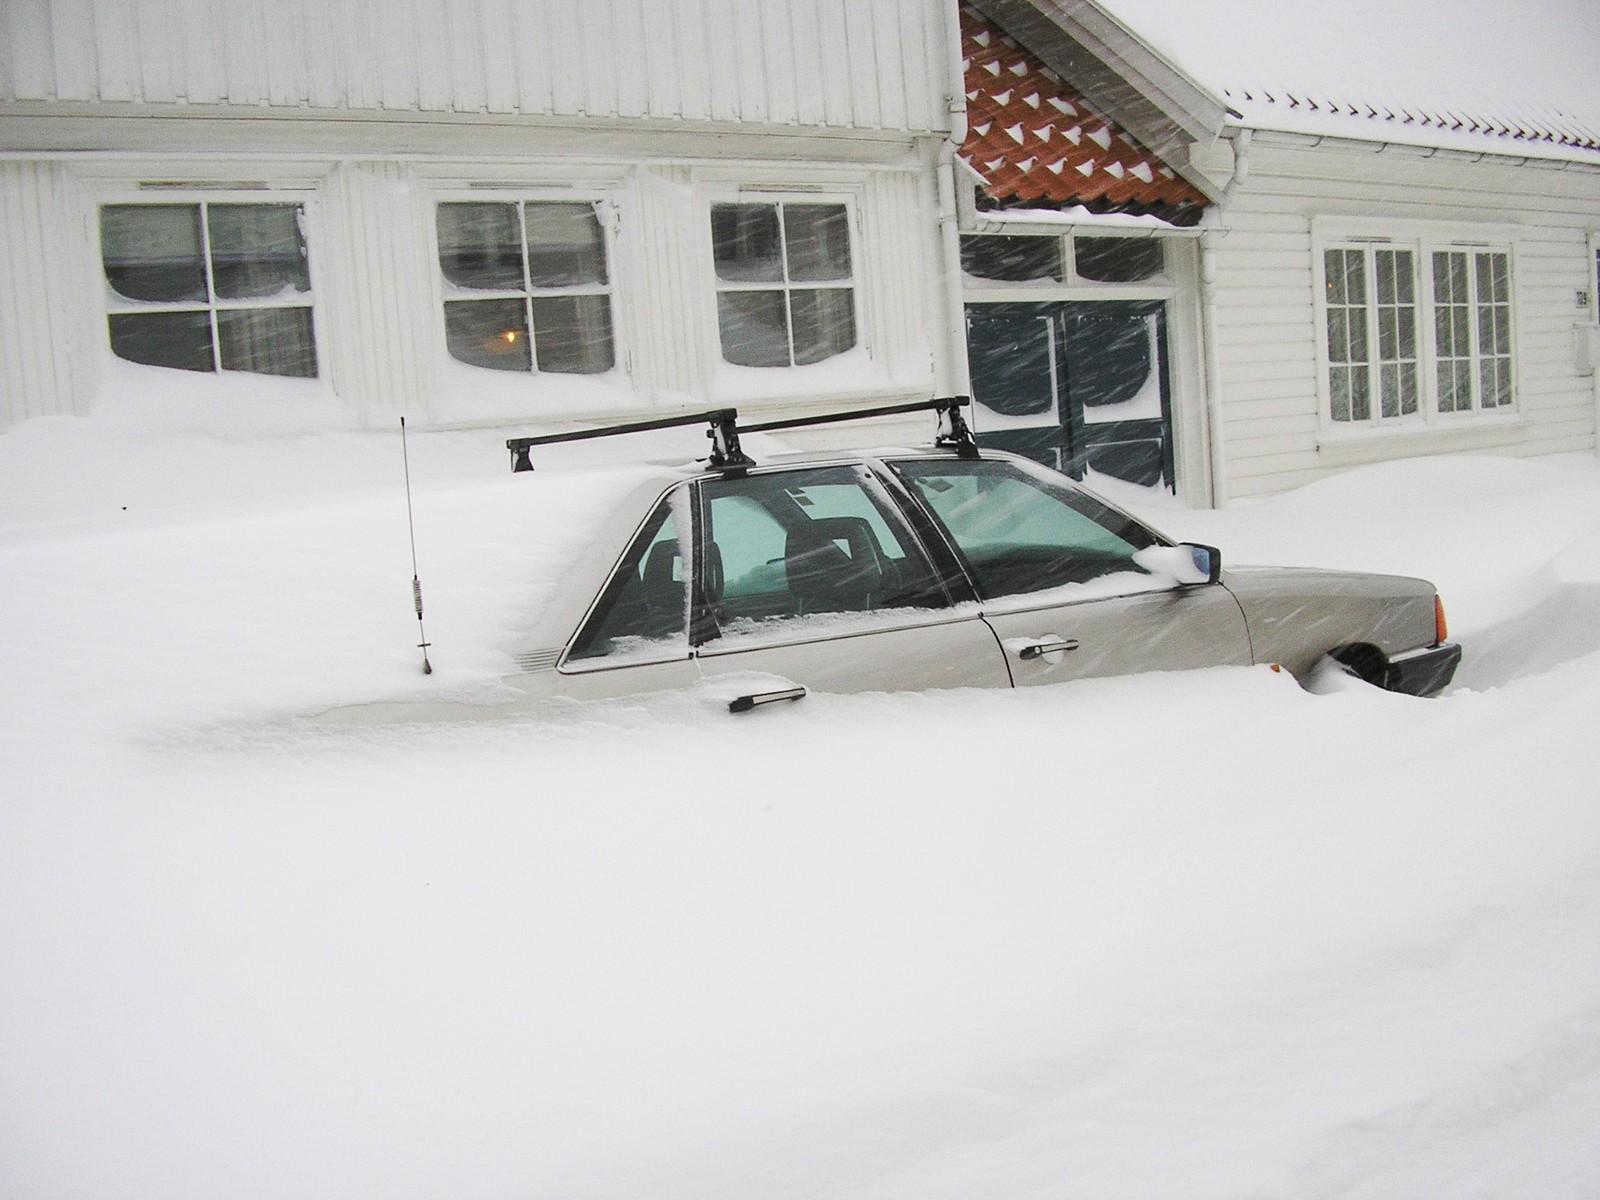 OLYMPUS DIGITAL CAMERA *** Local Caption *** snøkaos, nedsnødde biler, nedsnødde fortau